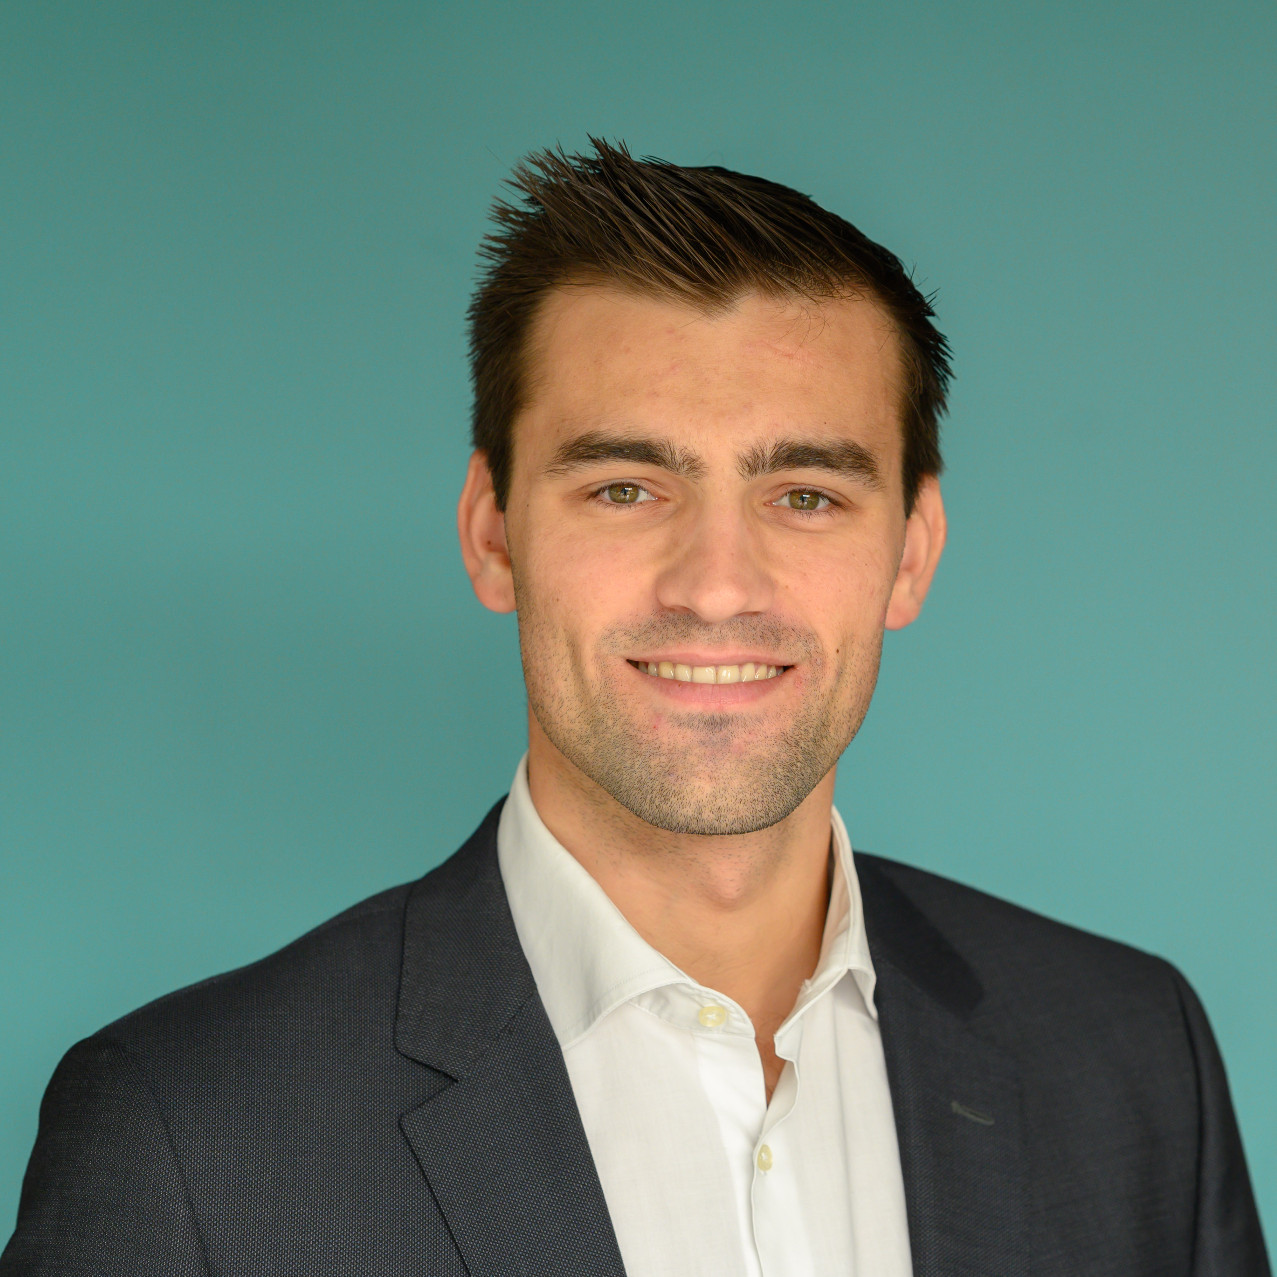 Maxime Vandemaele